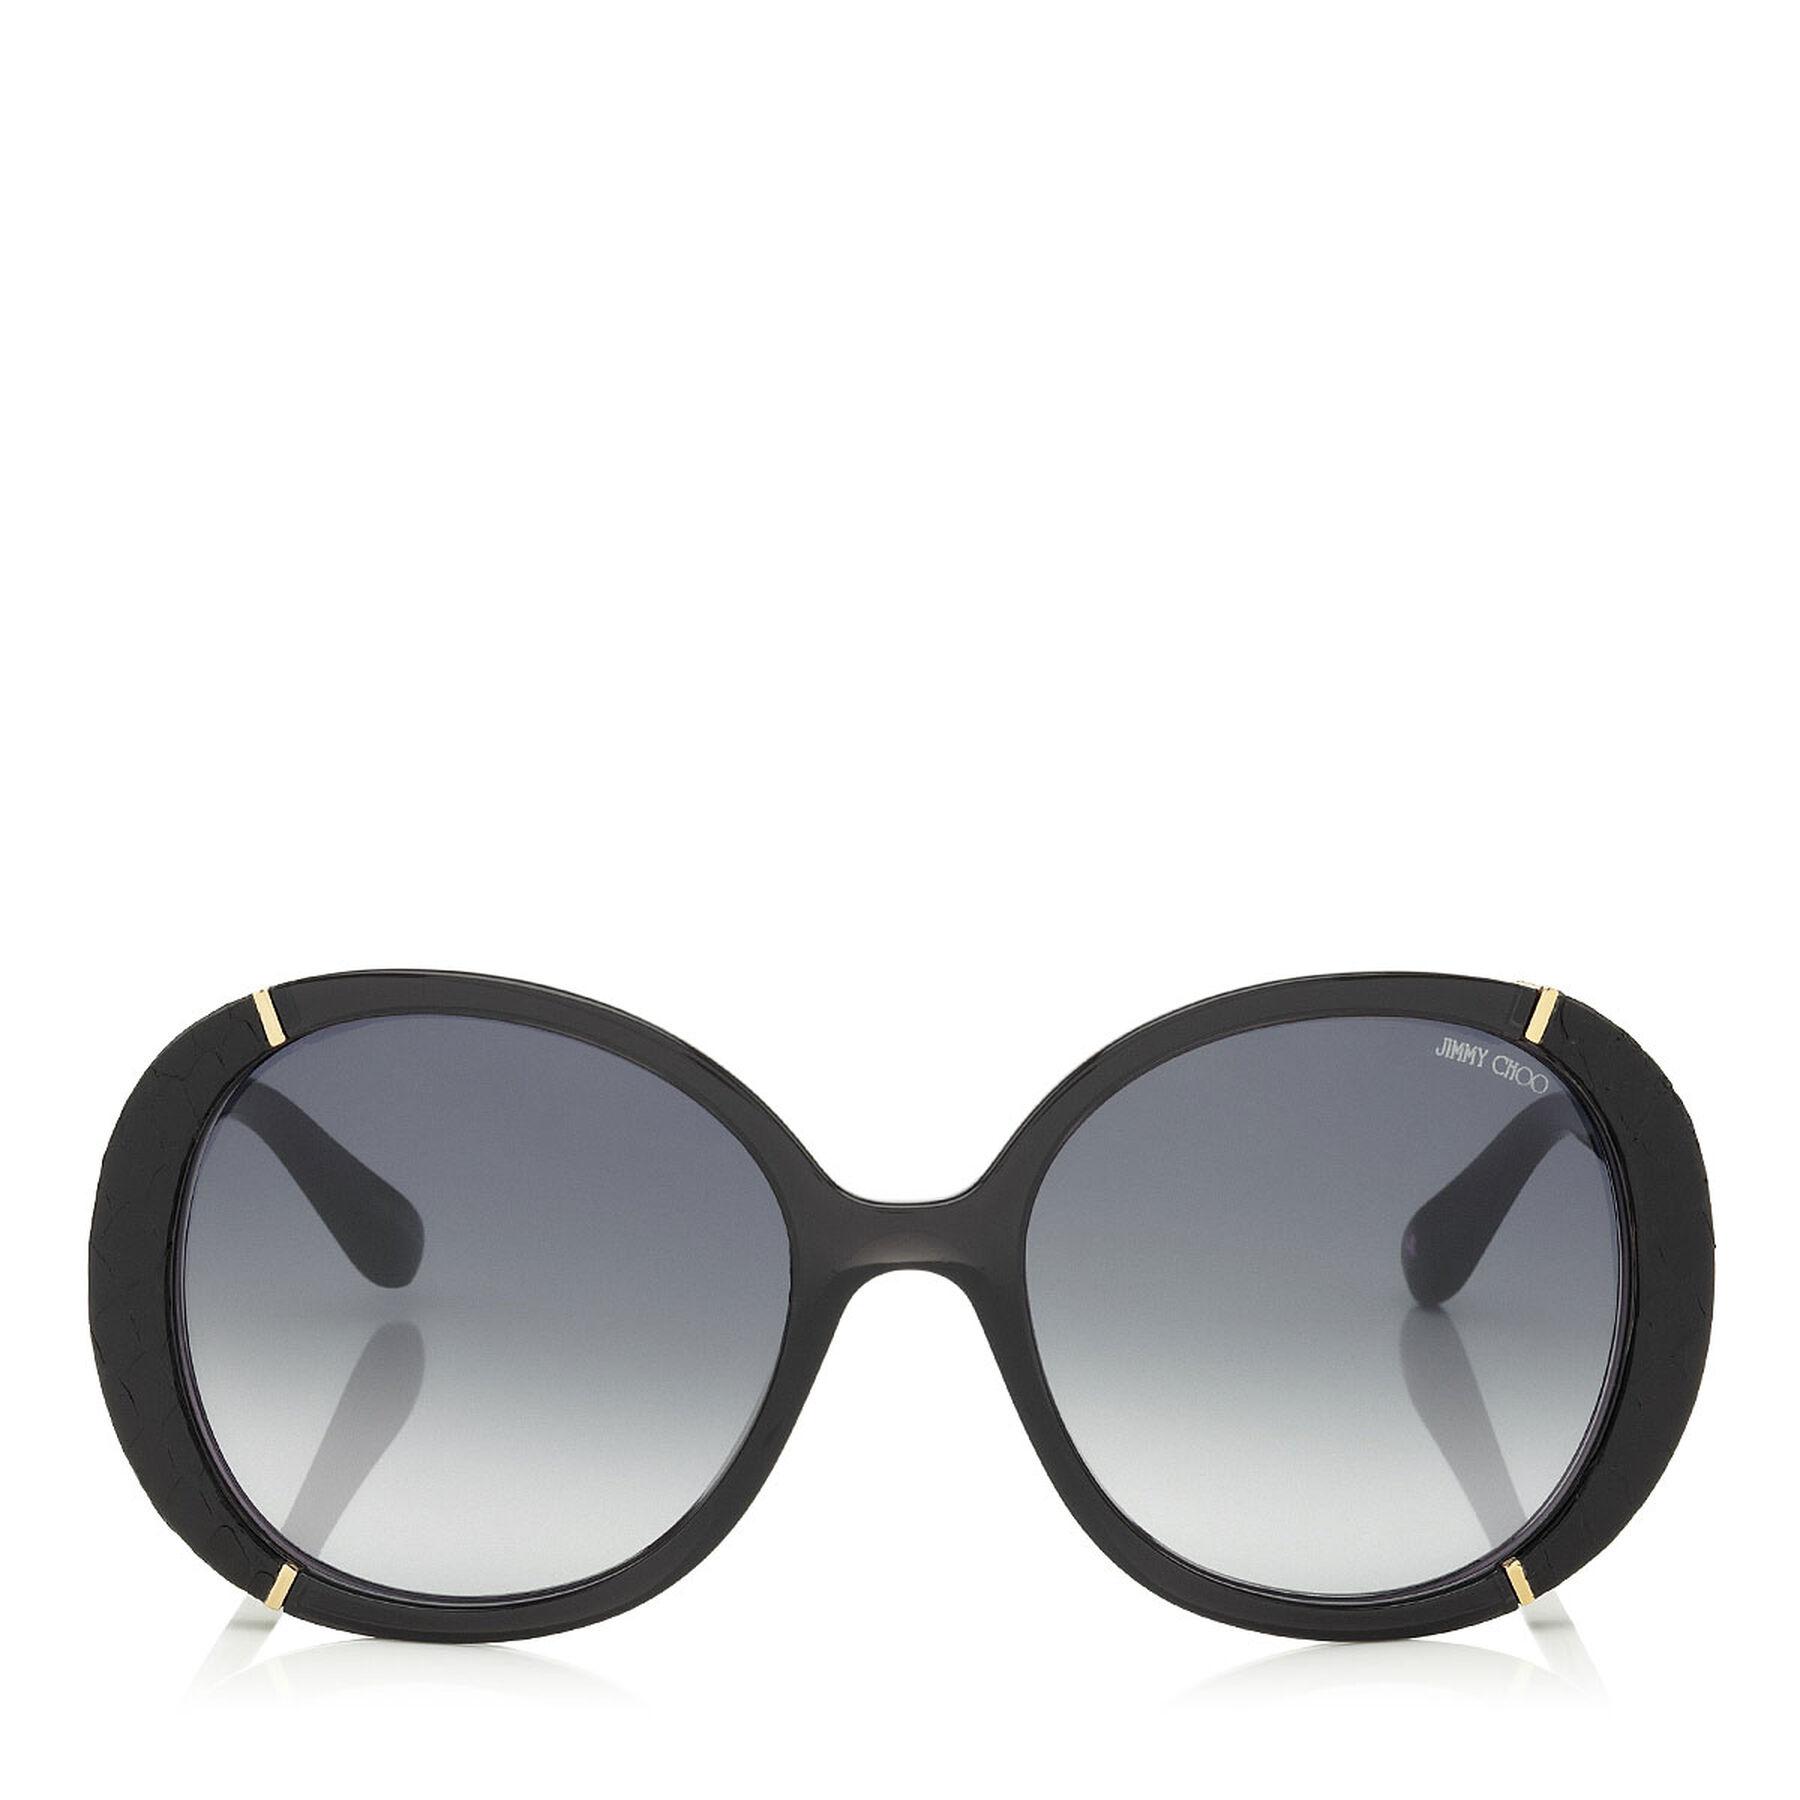 7c682a0de607 jimmy choo 2016 sunglasses for women